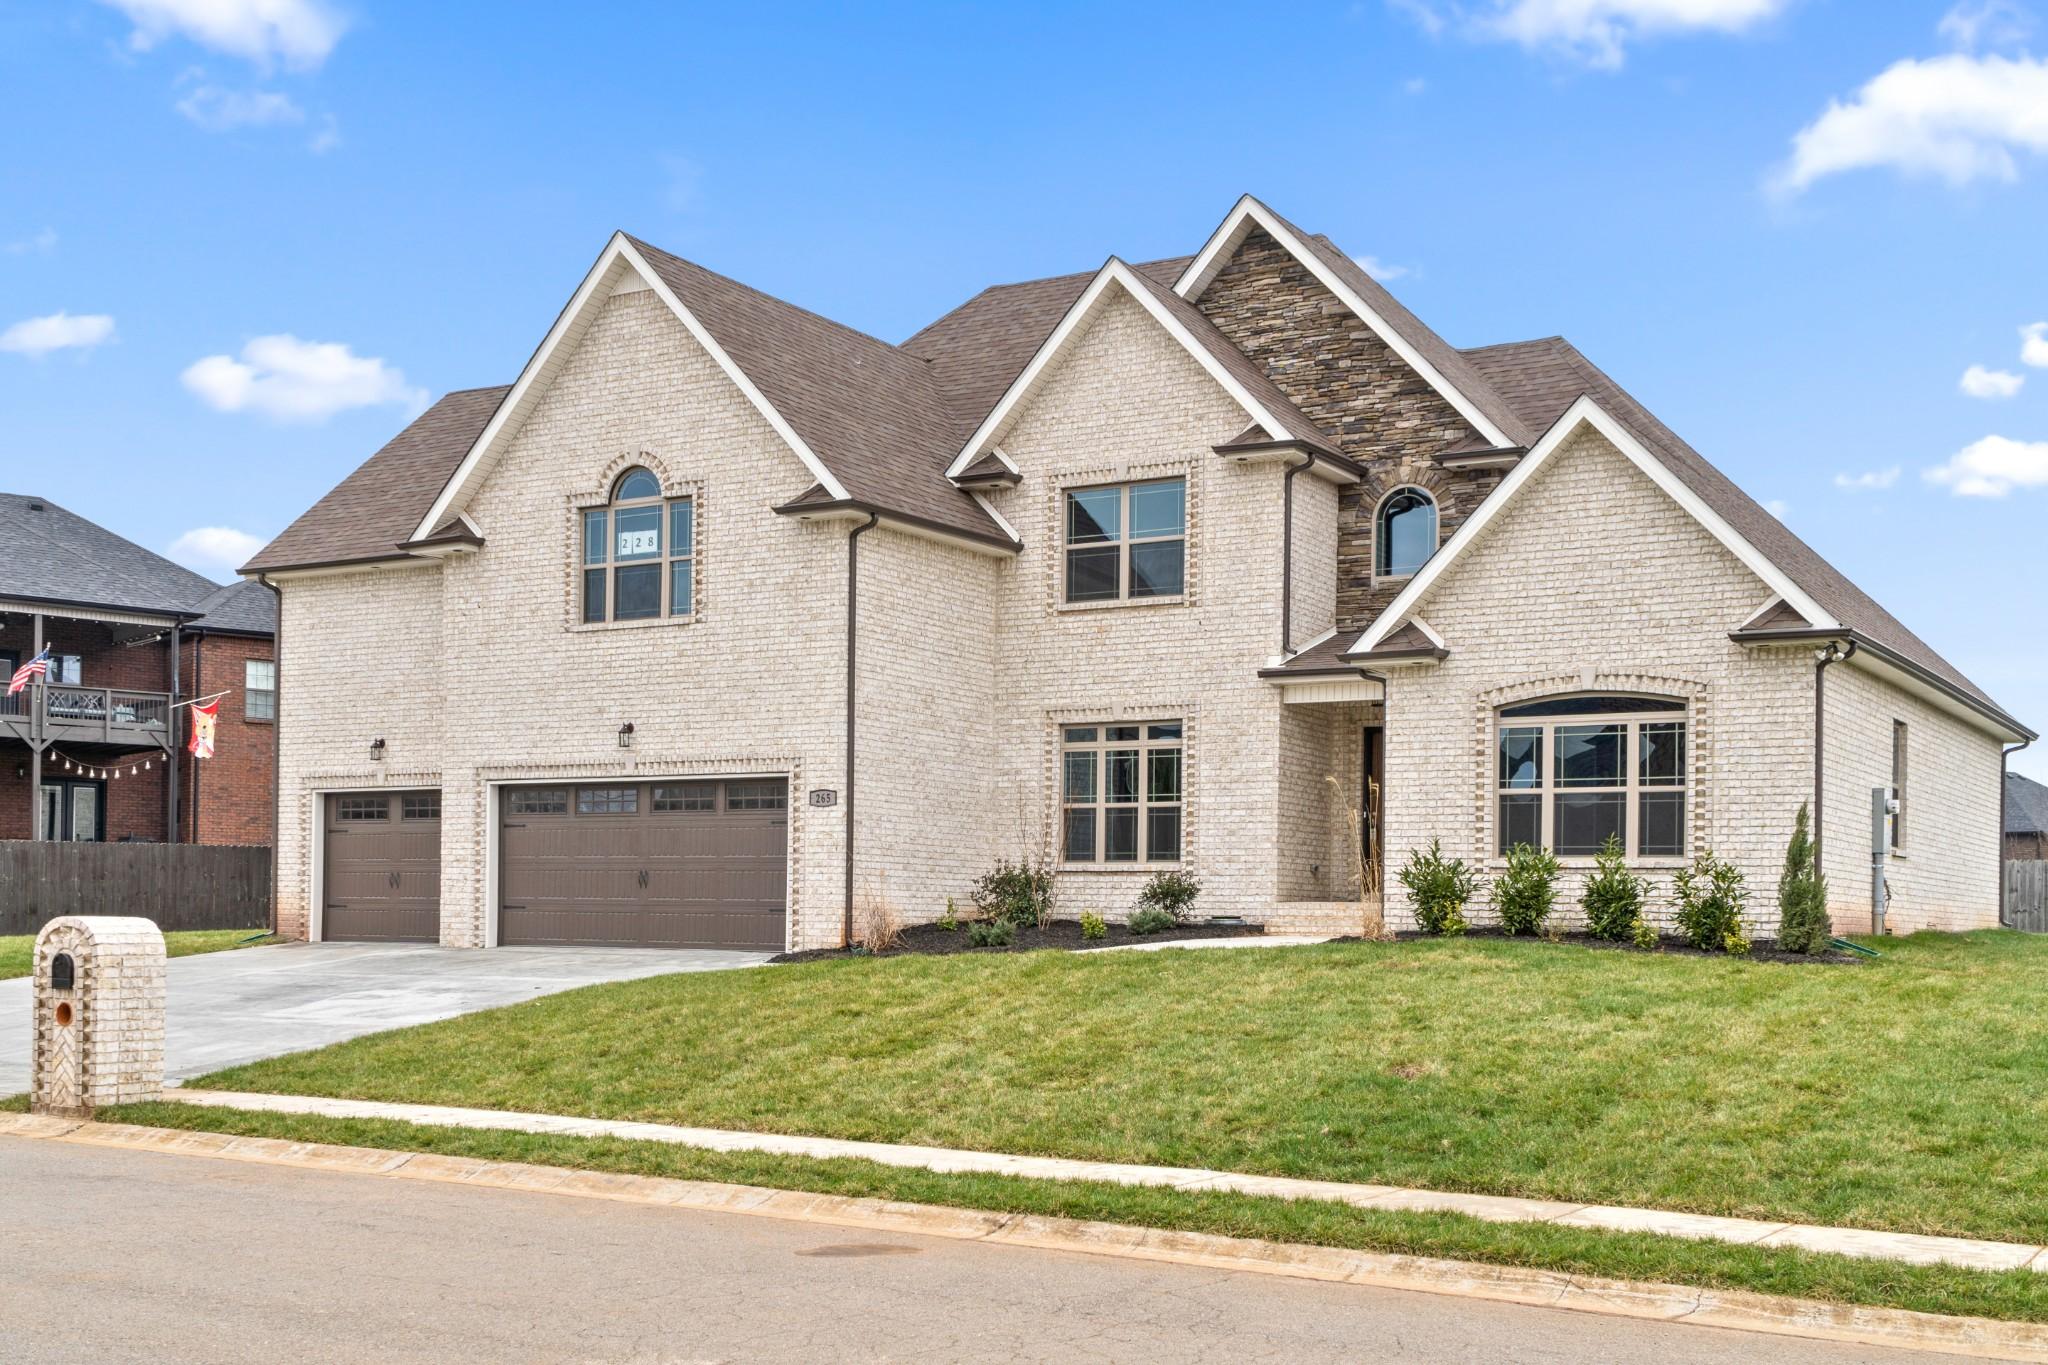 228 Farmington, Clarksville, TN 37043 - Clarksville, TN real estate listing